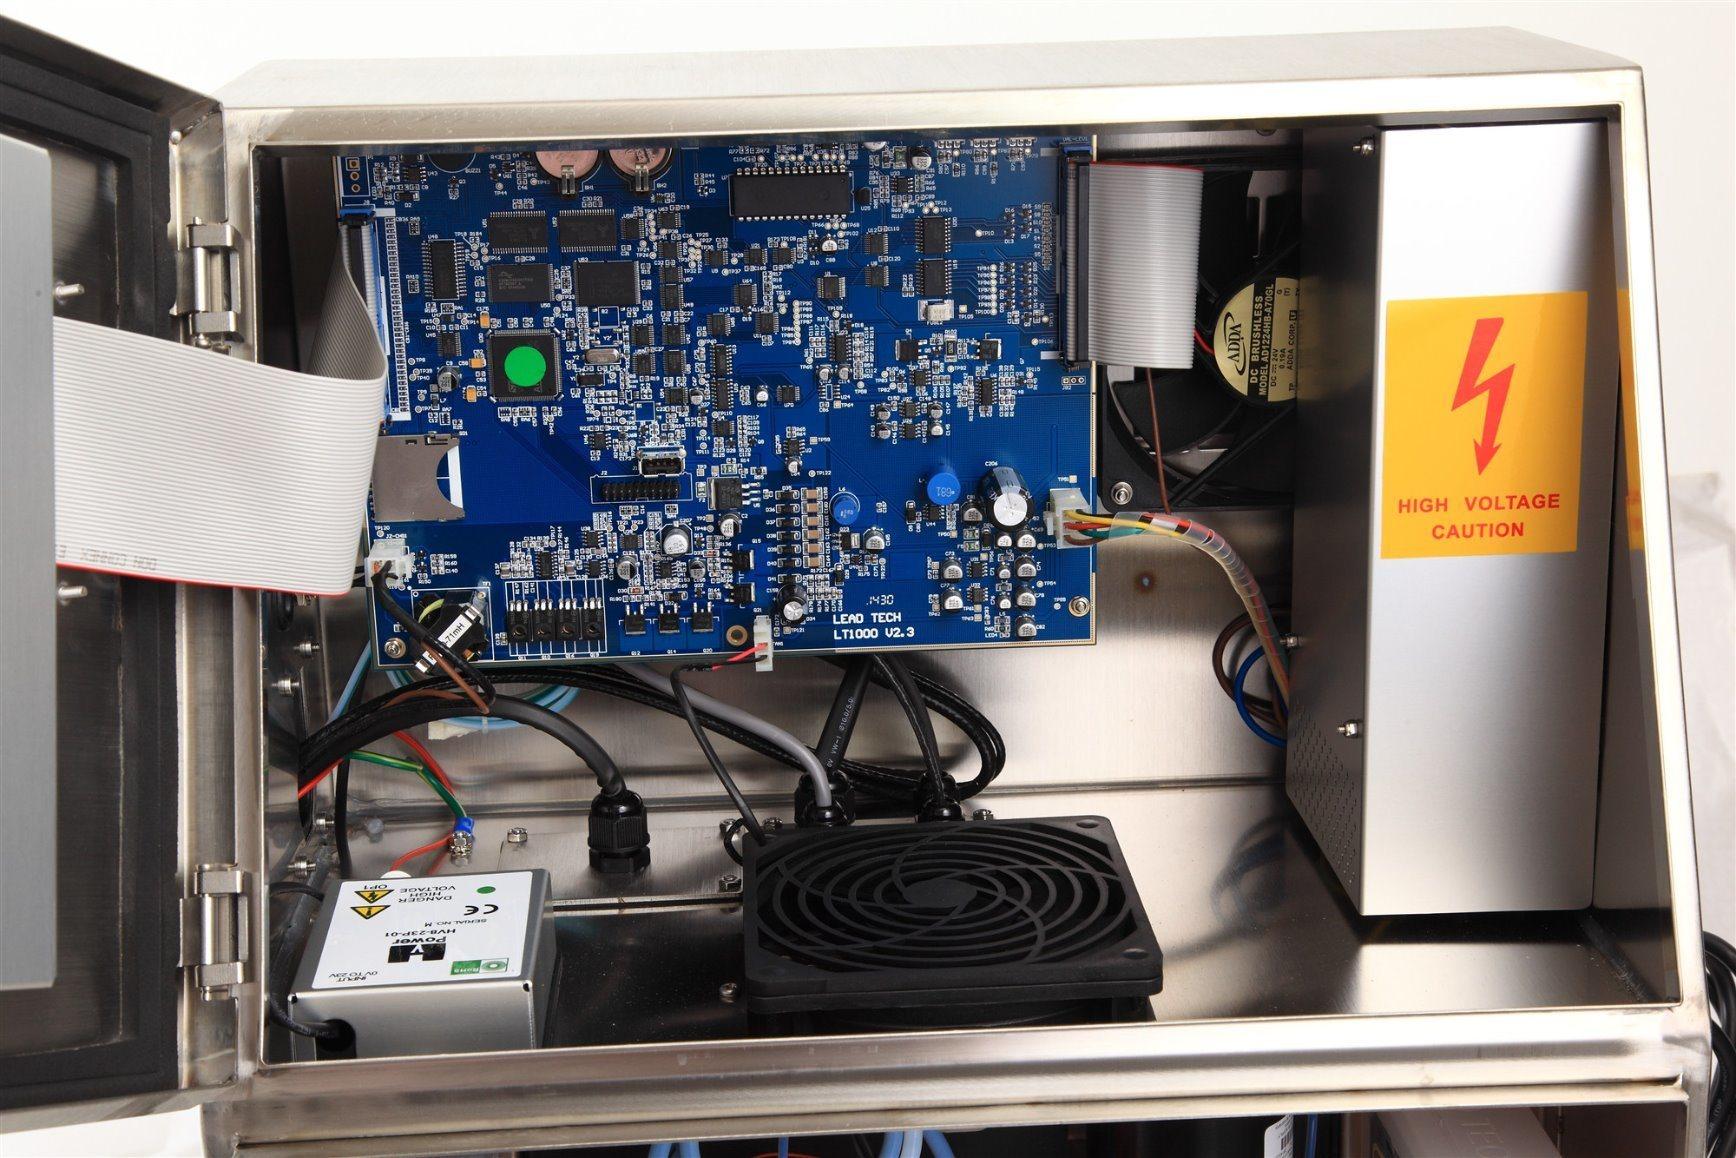 Lead Tech Lt1000s+ Black to Blue Coding Cij Inkjet Printer